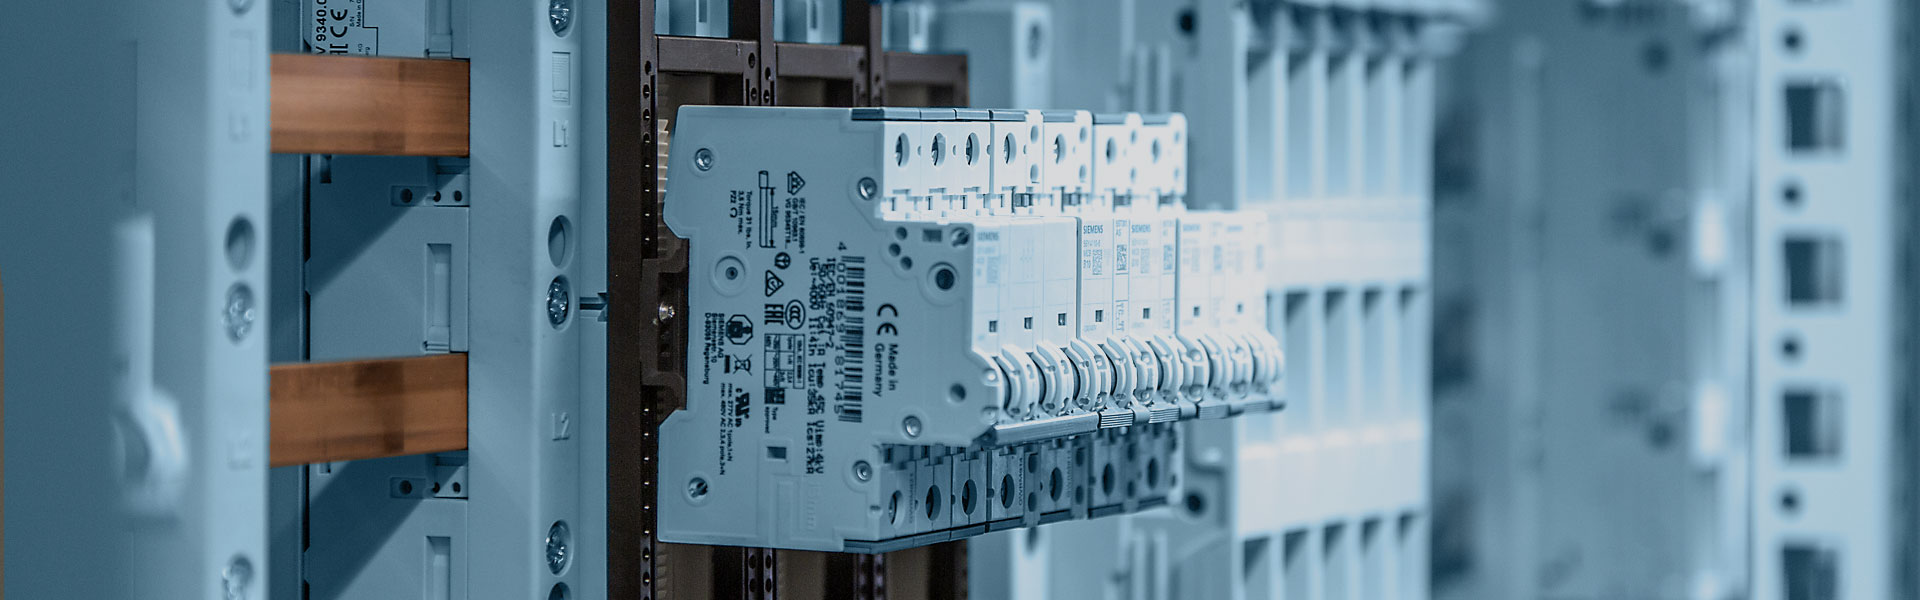 Online IAT Technik Prozesstechnik